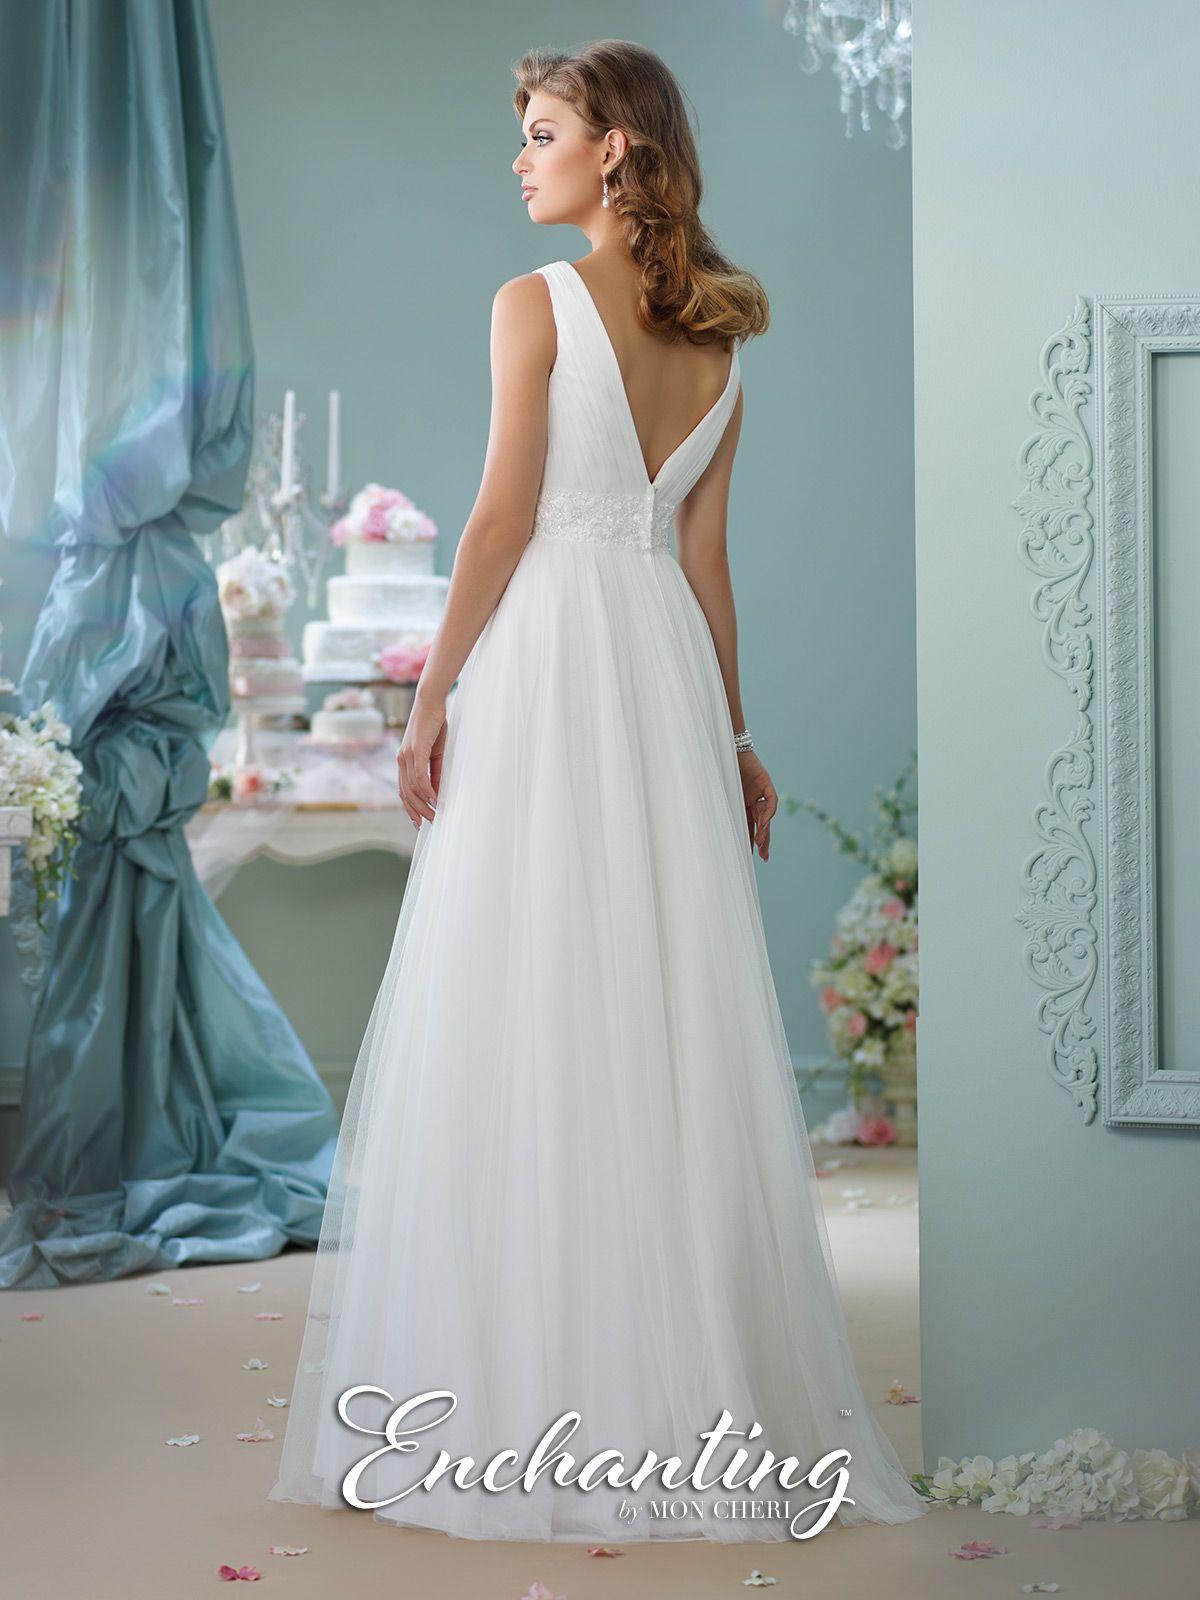 Modern wedding dresses by mon cheri wedding pinterest